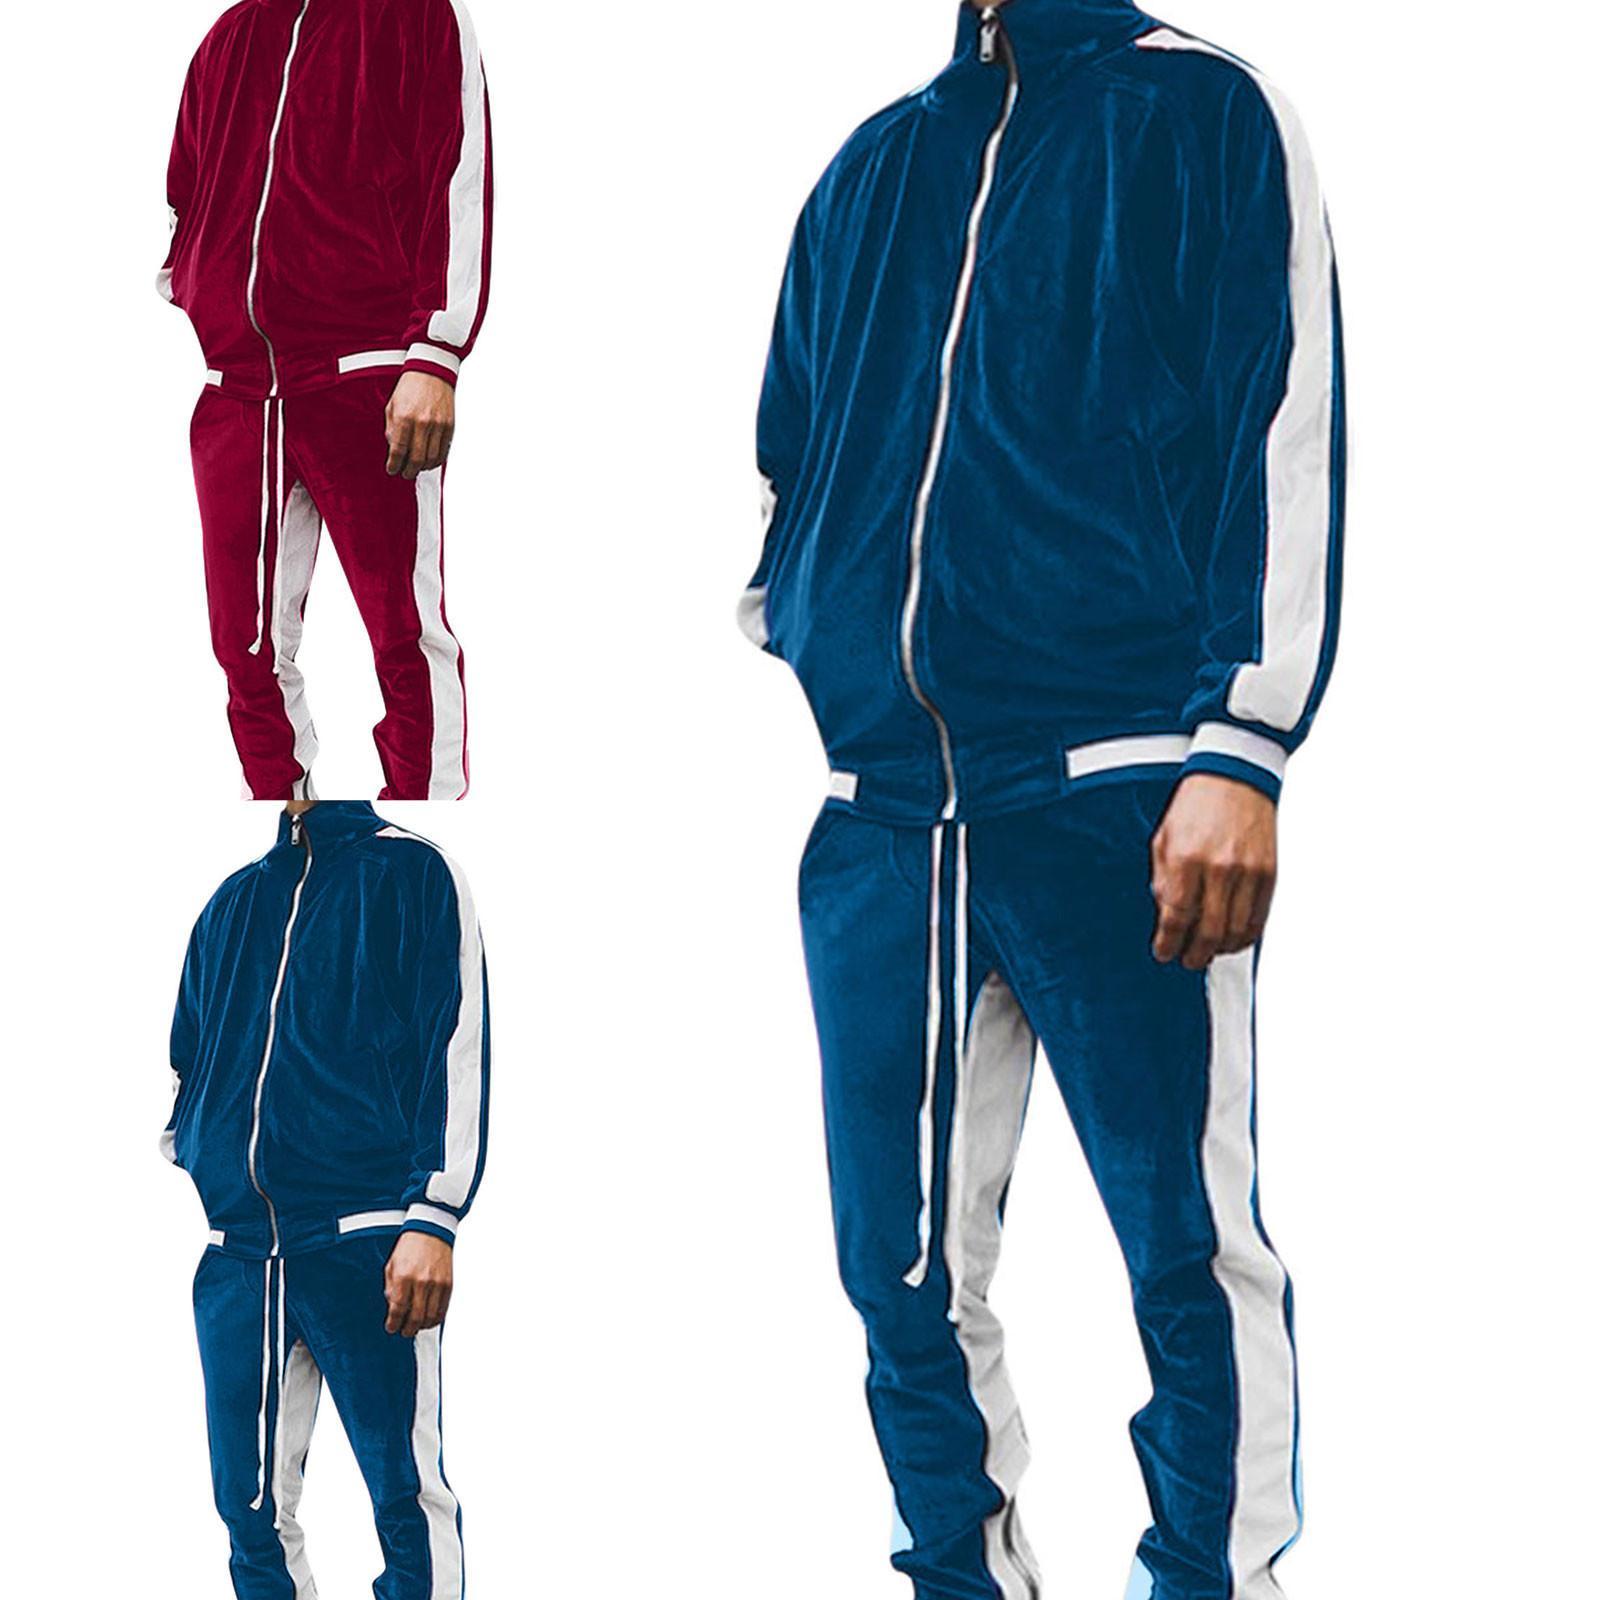 Gold Training Anzug Set Fision Herfst SPORT Pack Herren Plus Phiolen Dicke Pullover + Broek Warm Sweatshirt